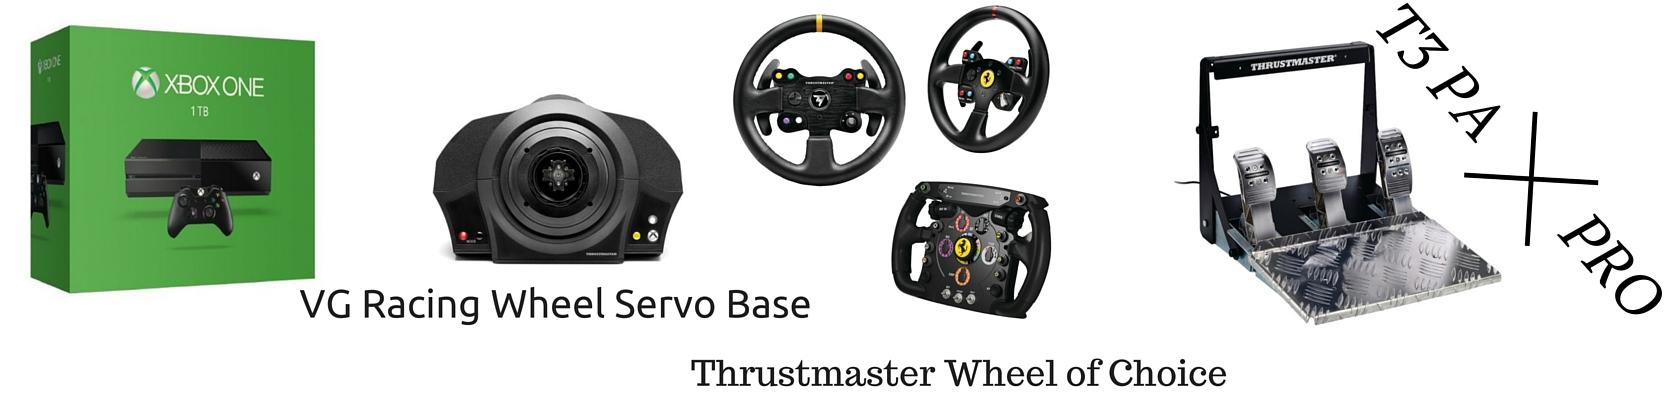 XboxOne Racing Wheel: Thrustmaster Servo, Wheel, T3PA-Pro